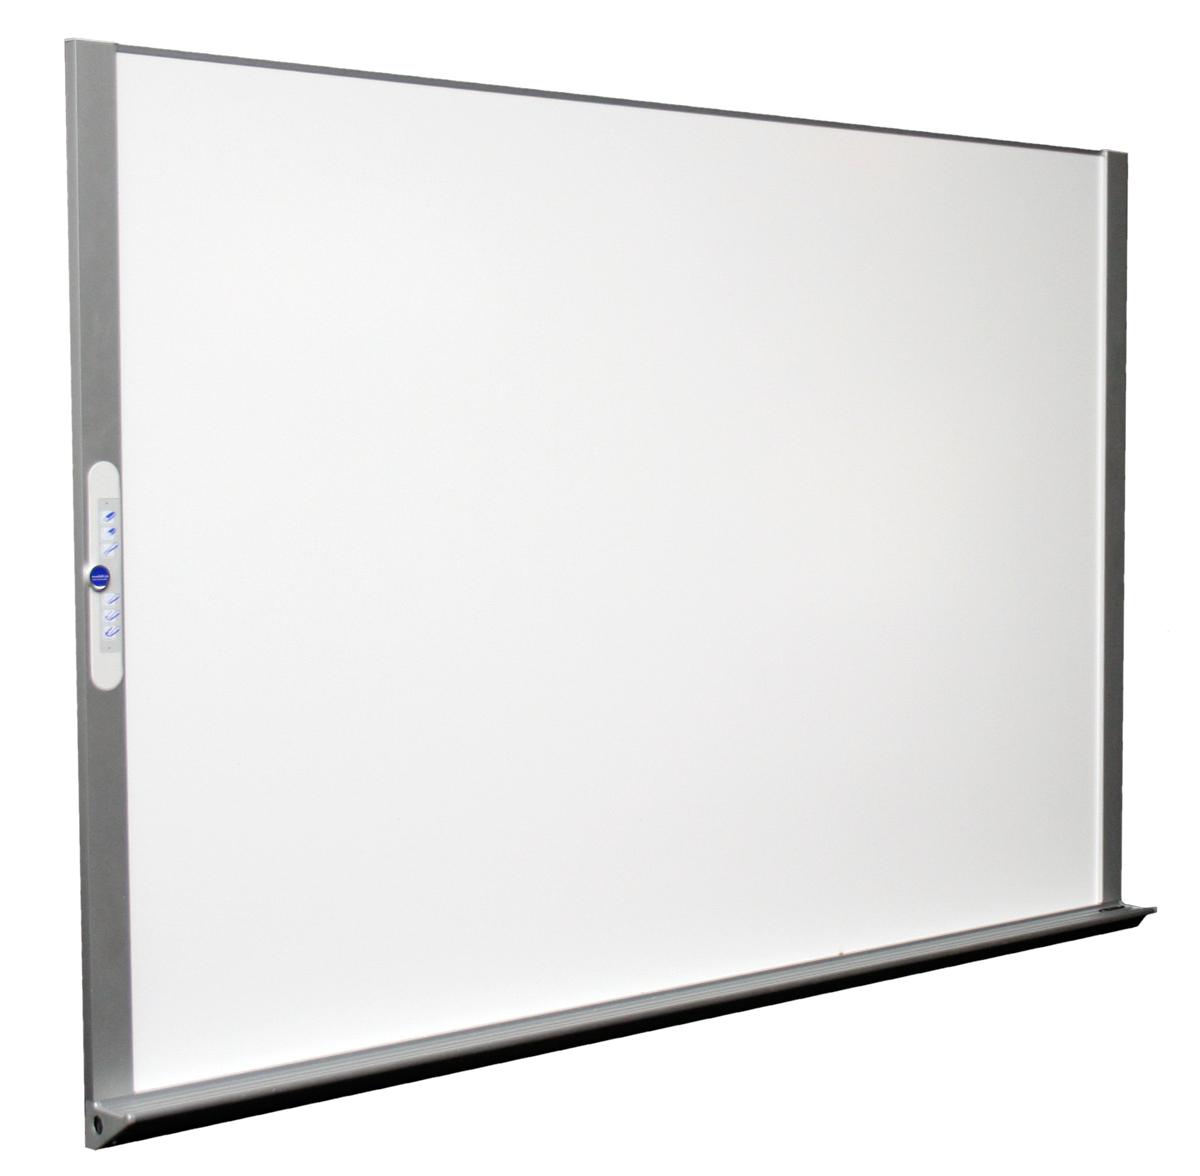 Vaddio trae a NAB el primer Video Whiteboard